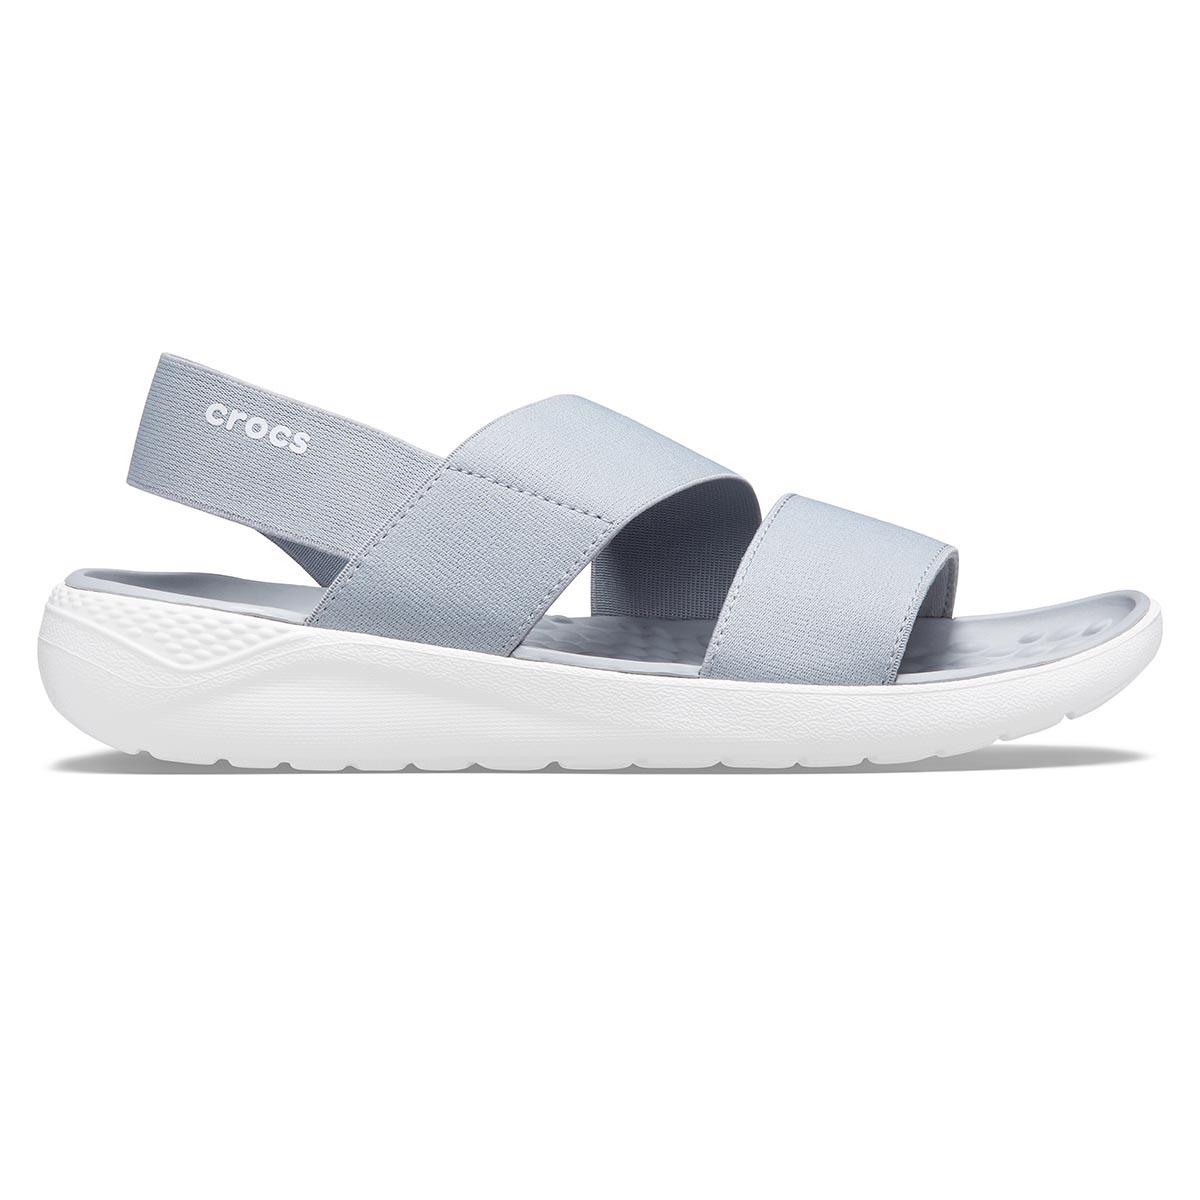 LiteRide Stretch Sandal W - Light Grey/White